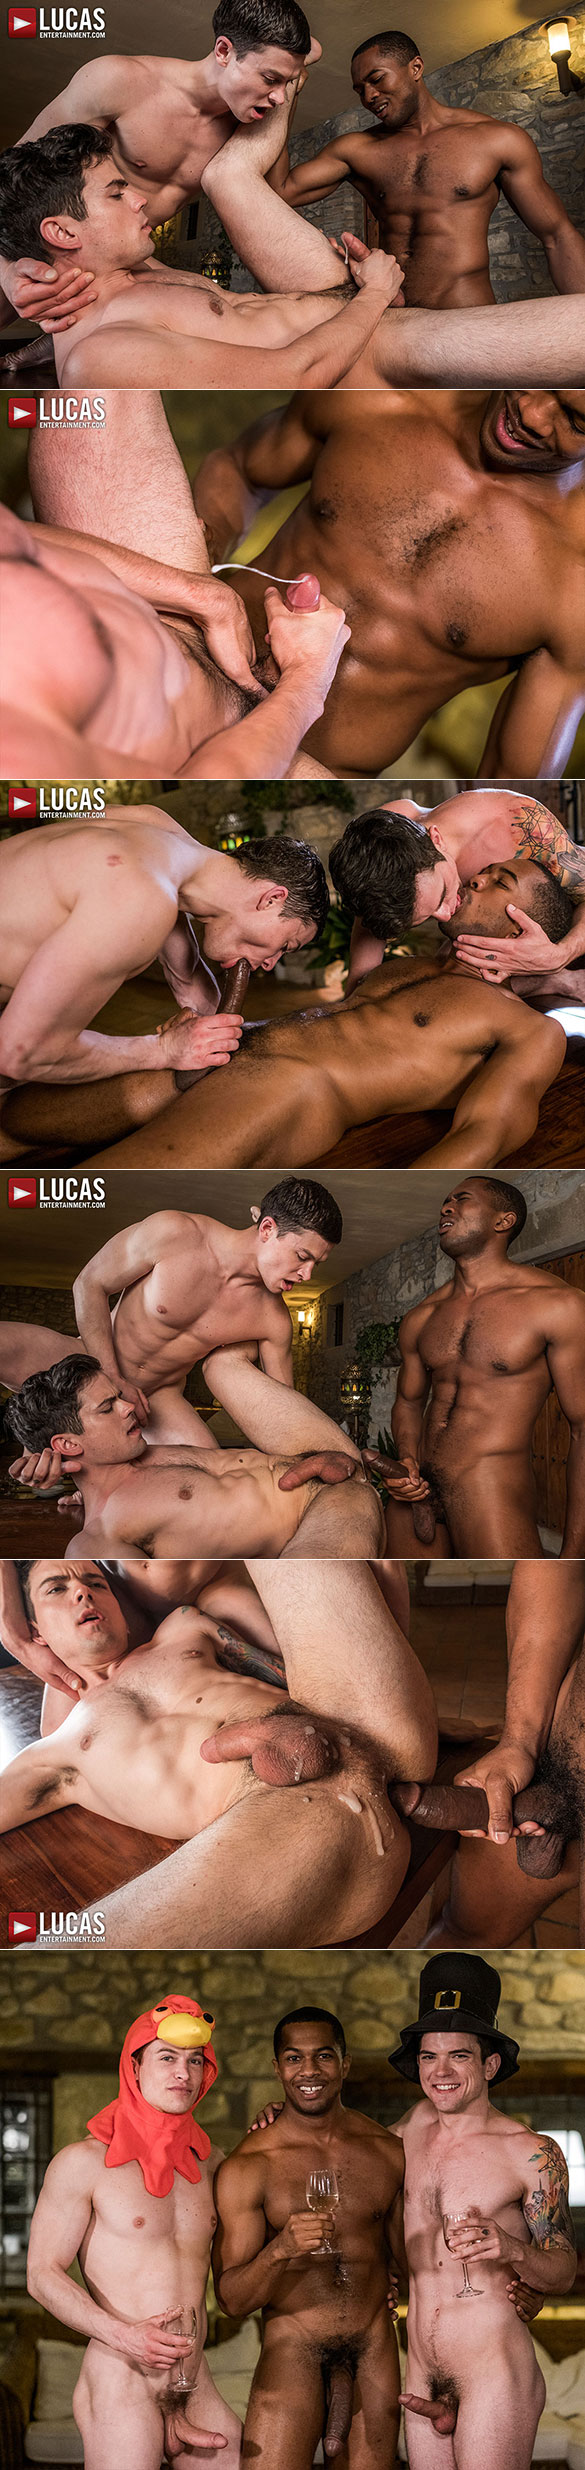 "Lucas Entertainment: Dakota Payne and Ruslan Angelo get stuffed with Sean Xavier's 10-inch cock in ""Bareback Thanksgiving"""